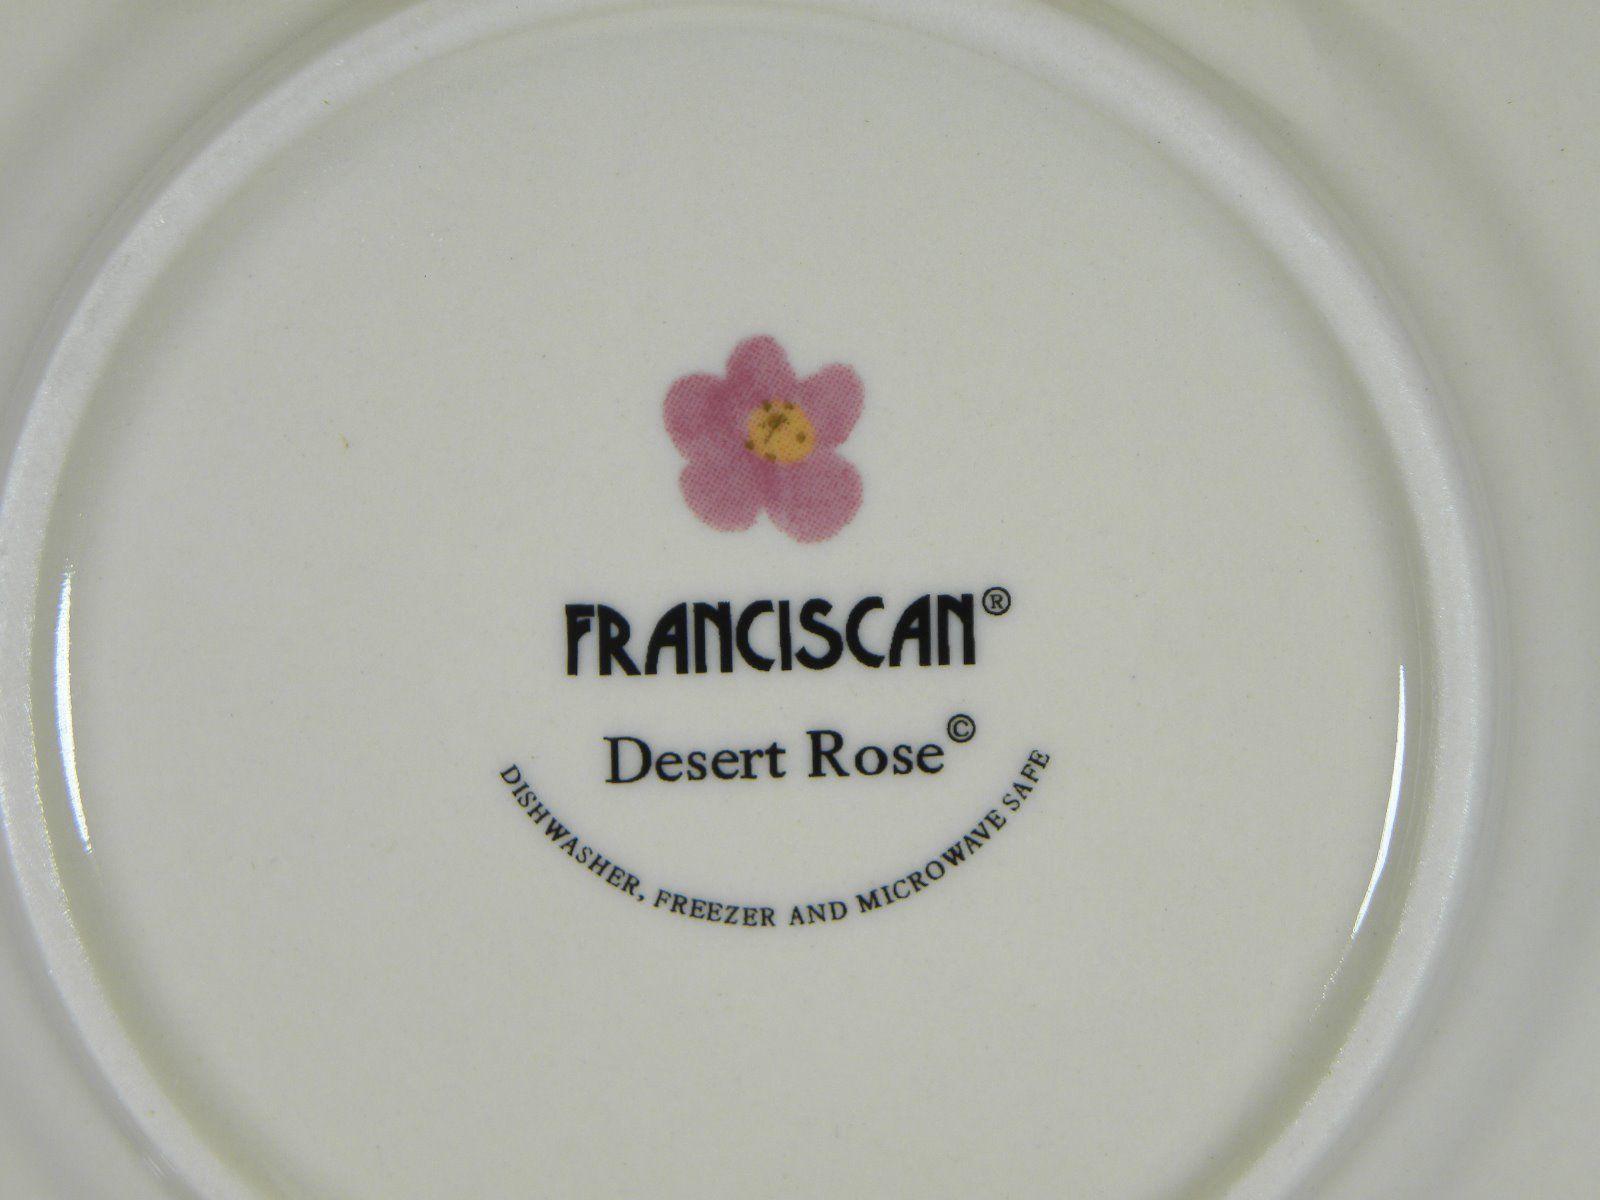 Franciscan Desert Rose Bread & Butter Plates Set of 4 BRAND NEW PRODUCTION